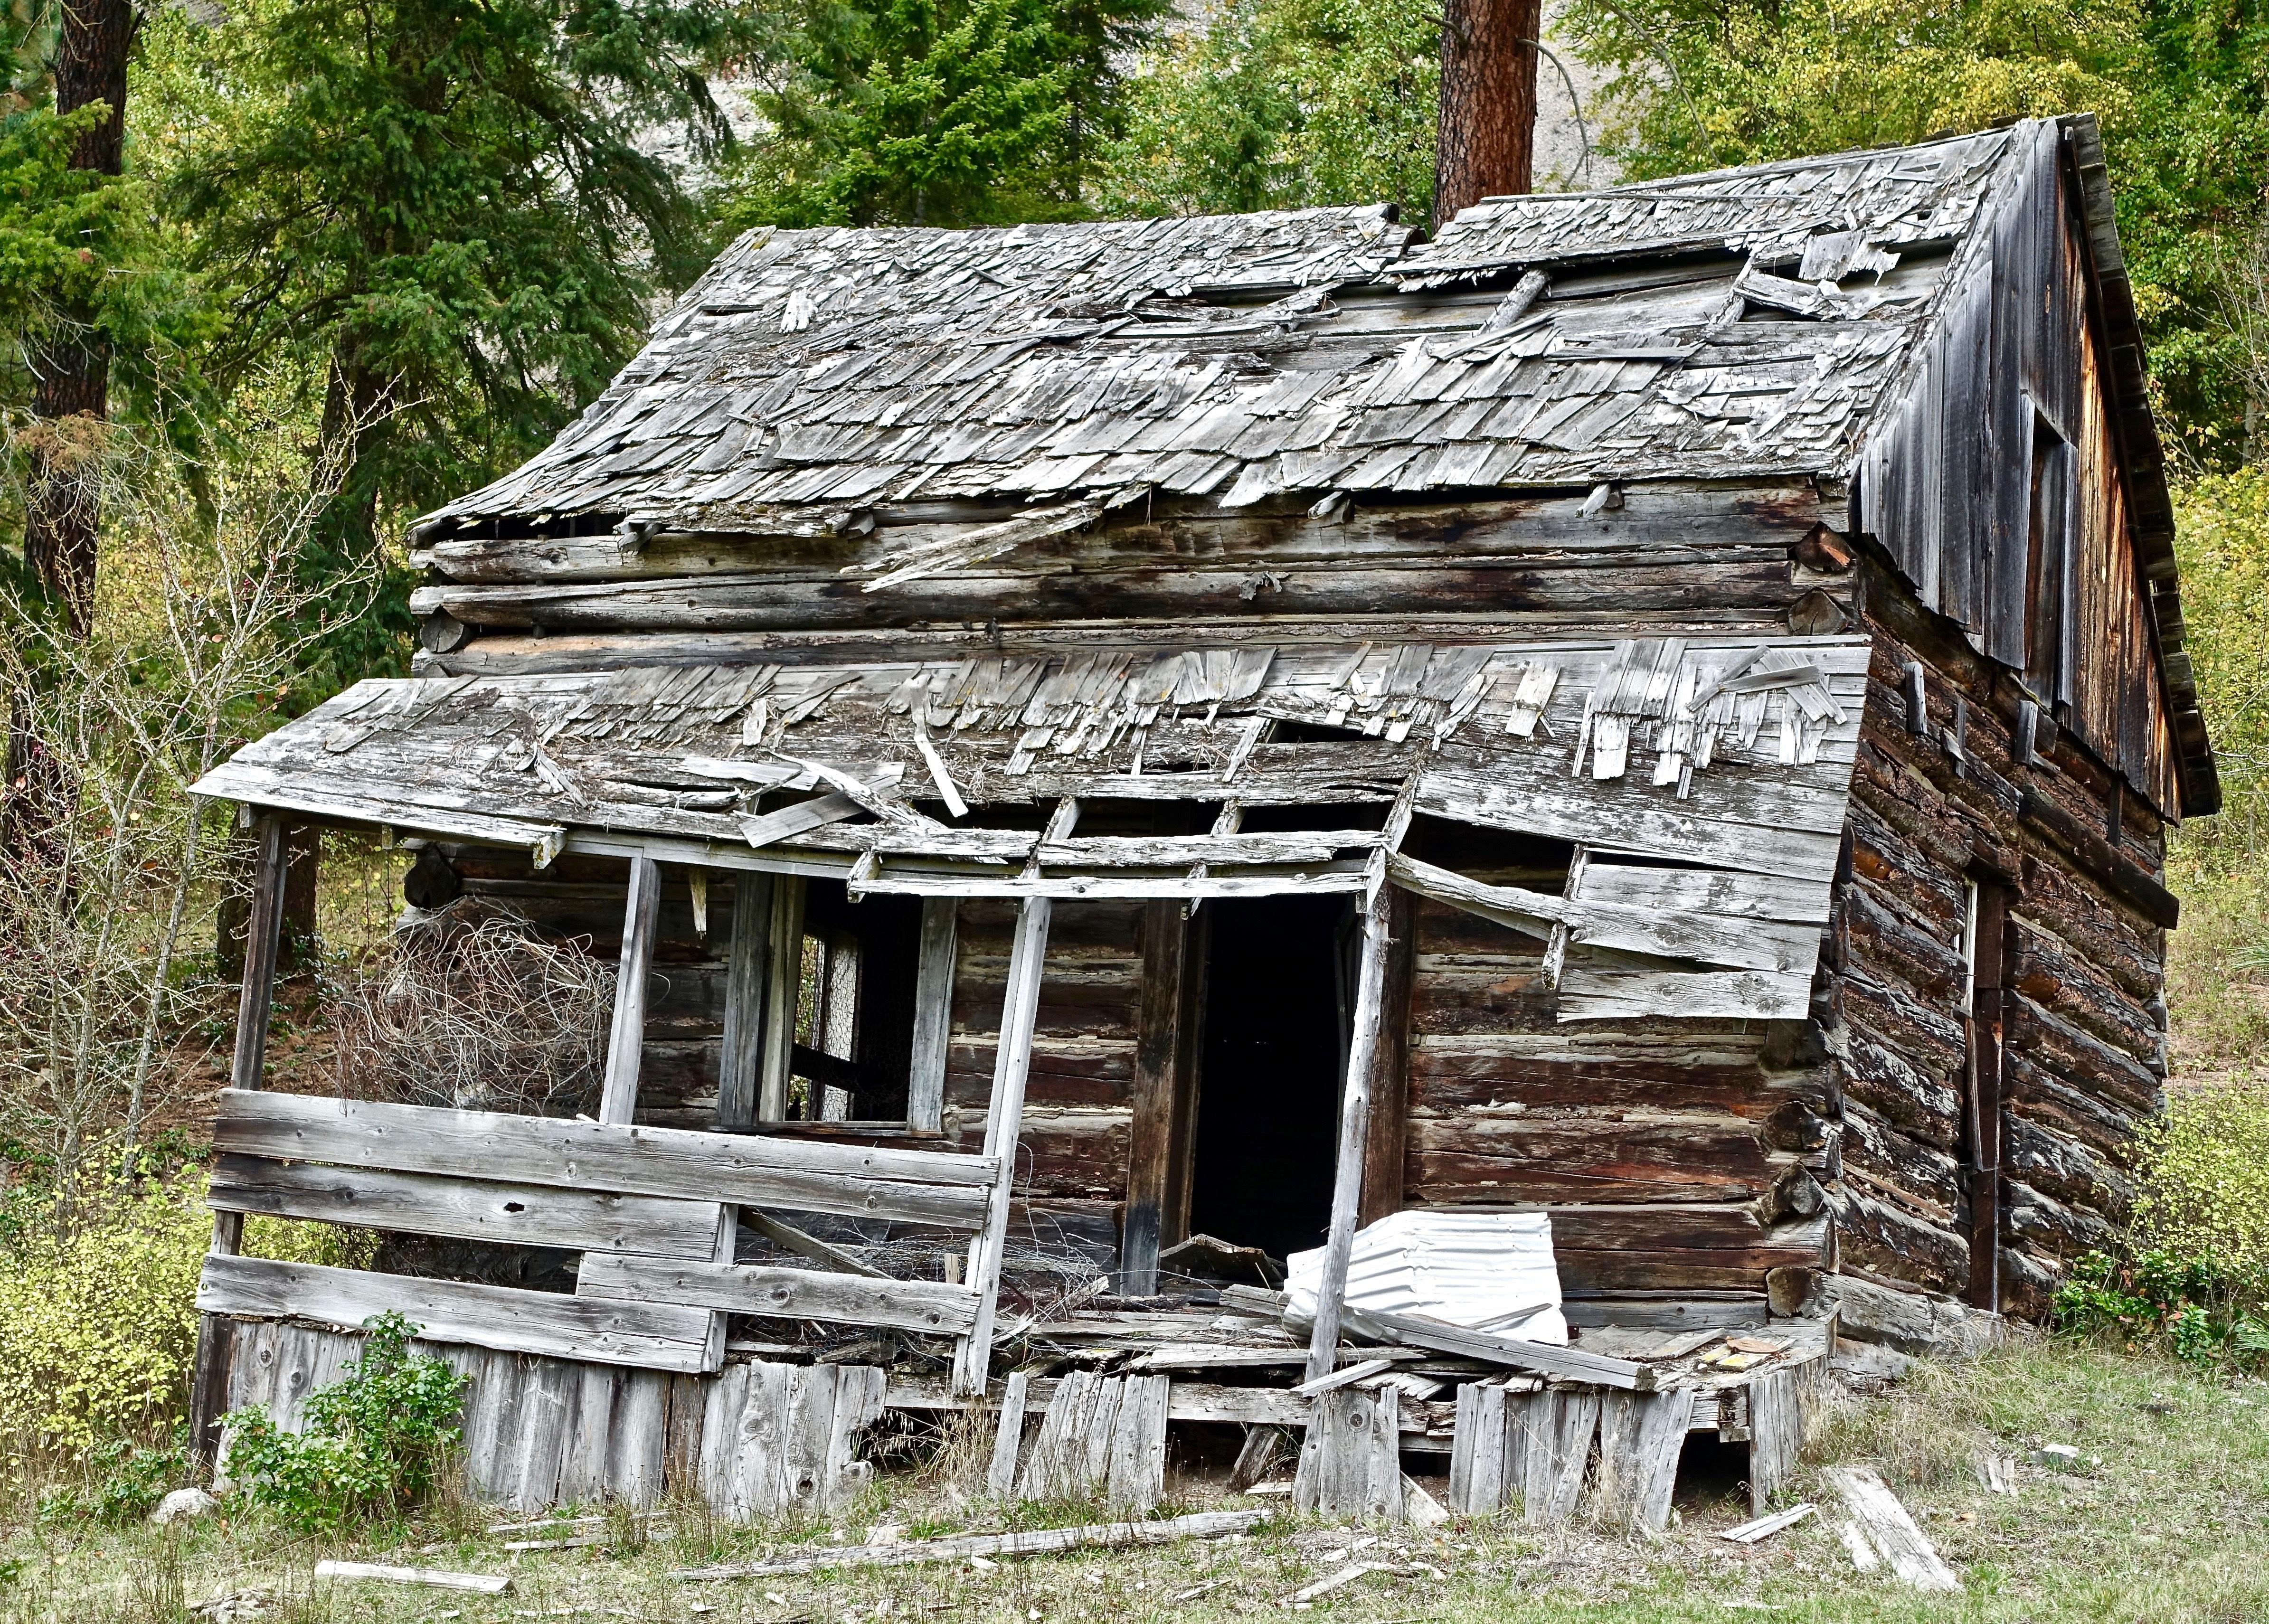 images gratuites maison b timent grange rustique village rural chalet ruines d labr. Black Bedroom Furniture Sets. Home Design Ideas